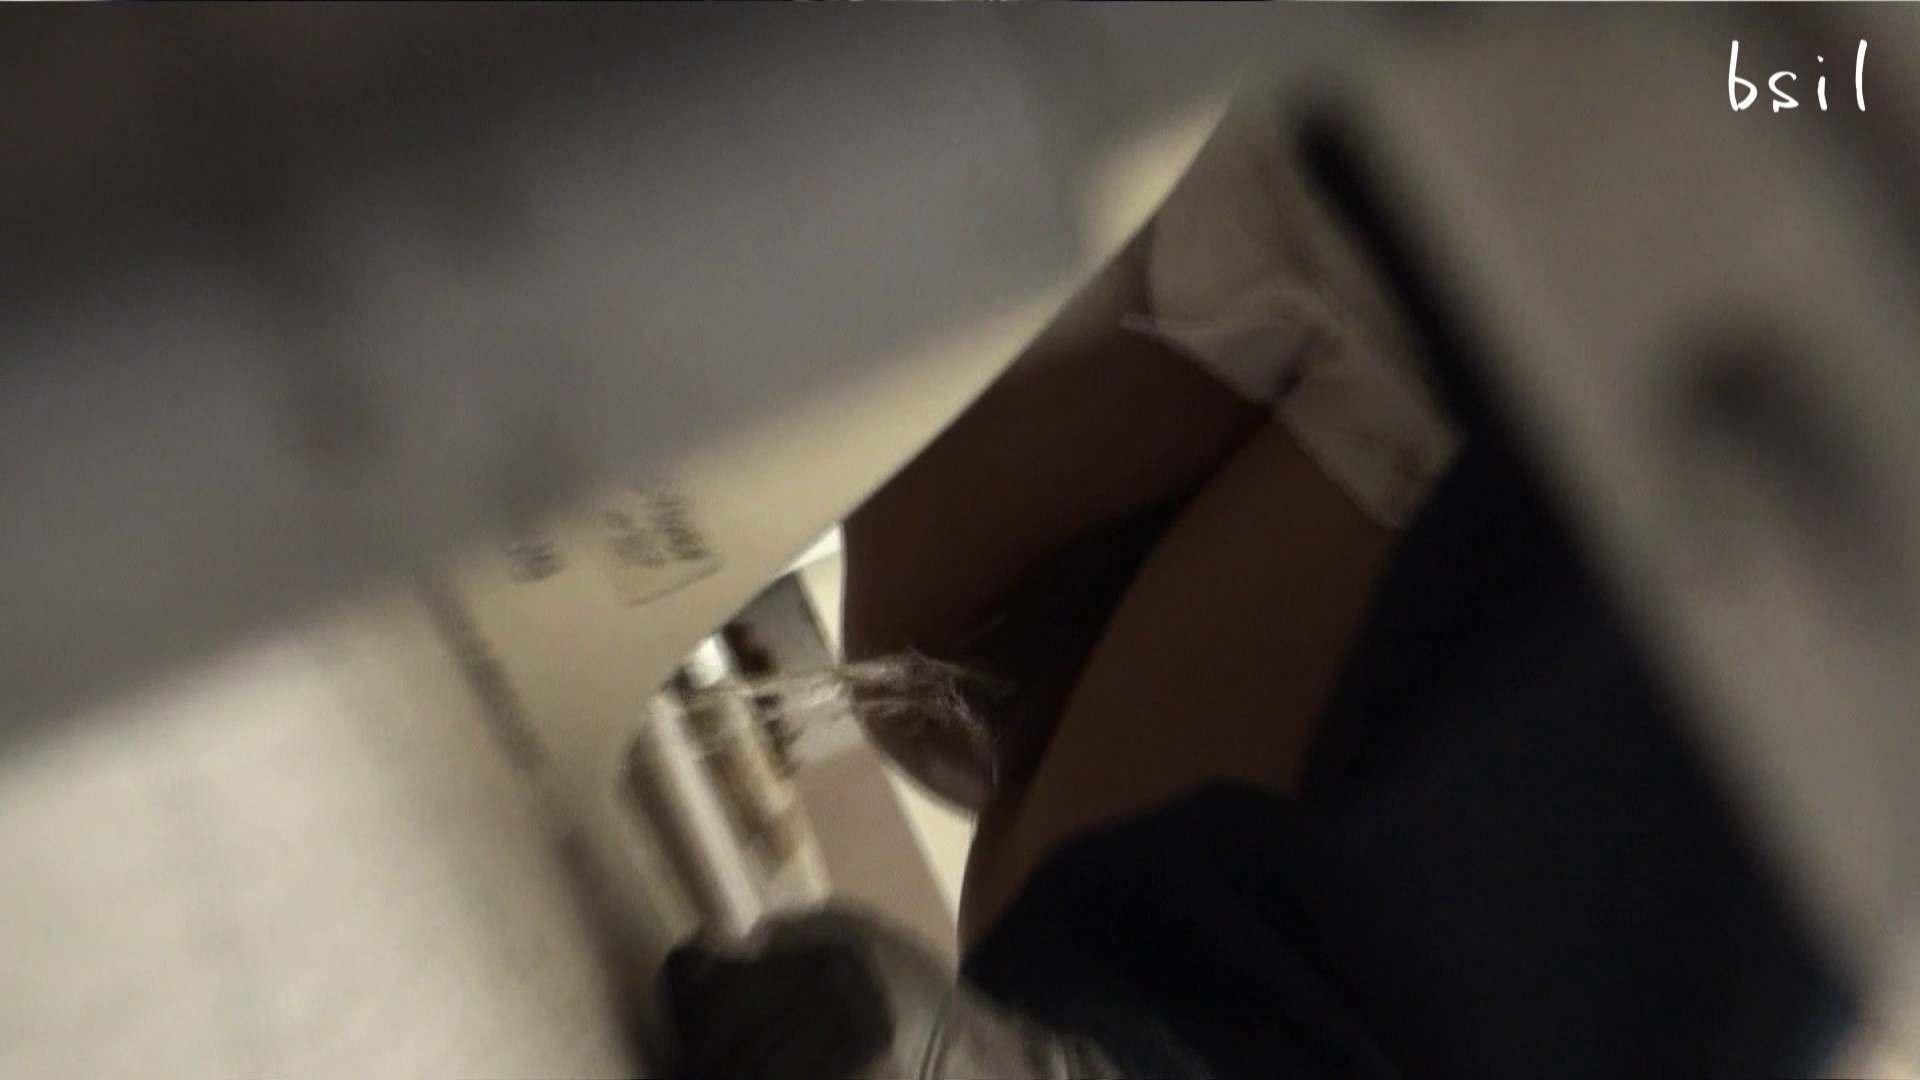 至高下半身盗撮-PREMIUM-【院内病棟編 】 vol.01 盗撮 ヌード画像 38PICs 3